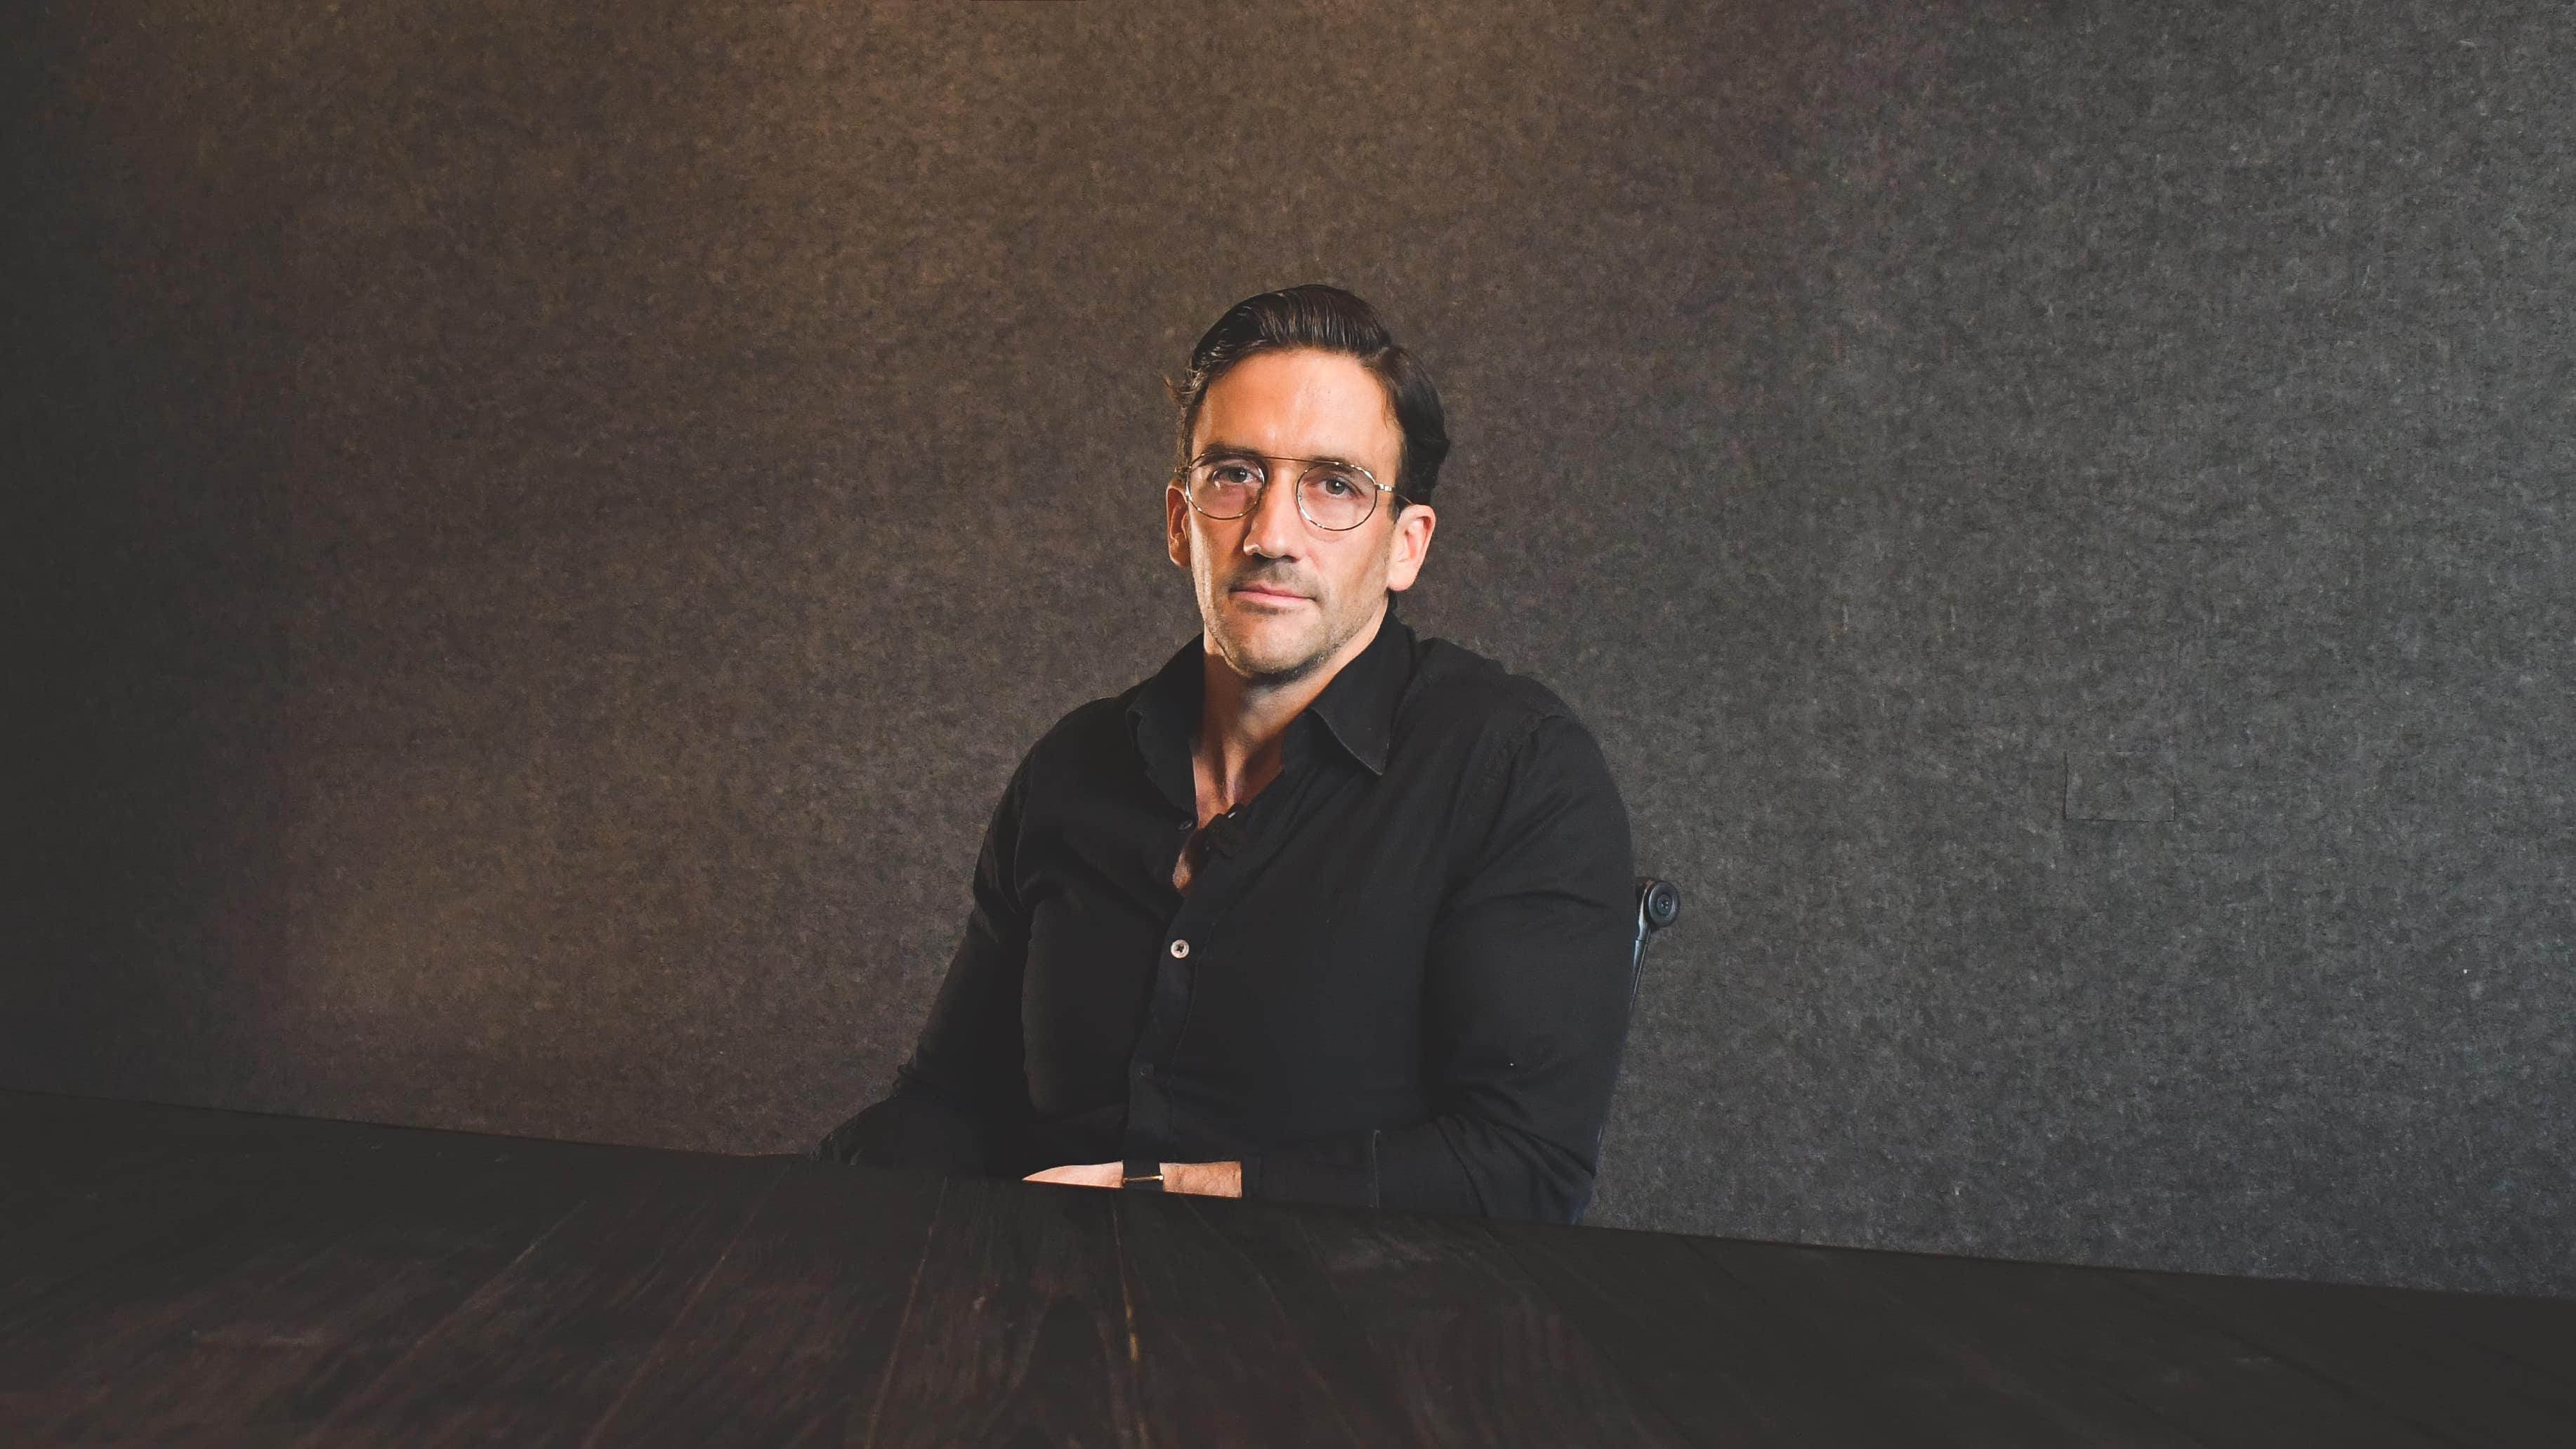 Become an Architect as a Developer with Matthew Rosenberg